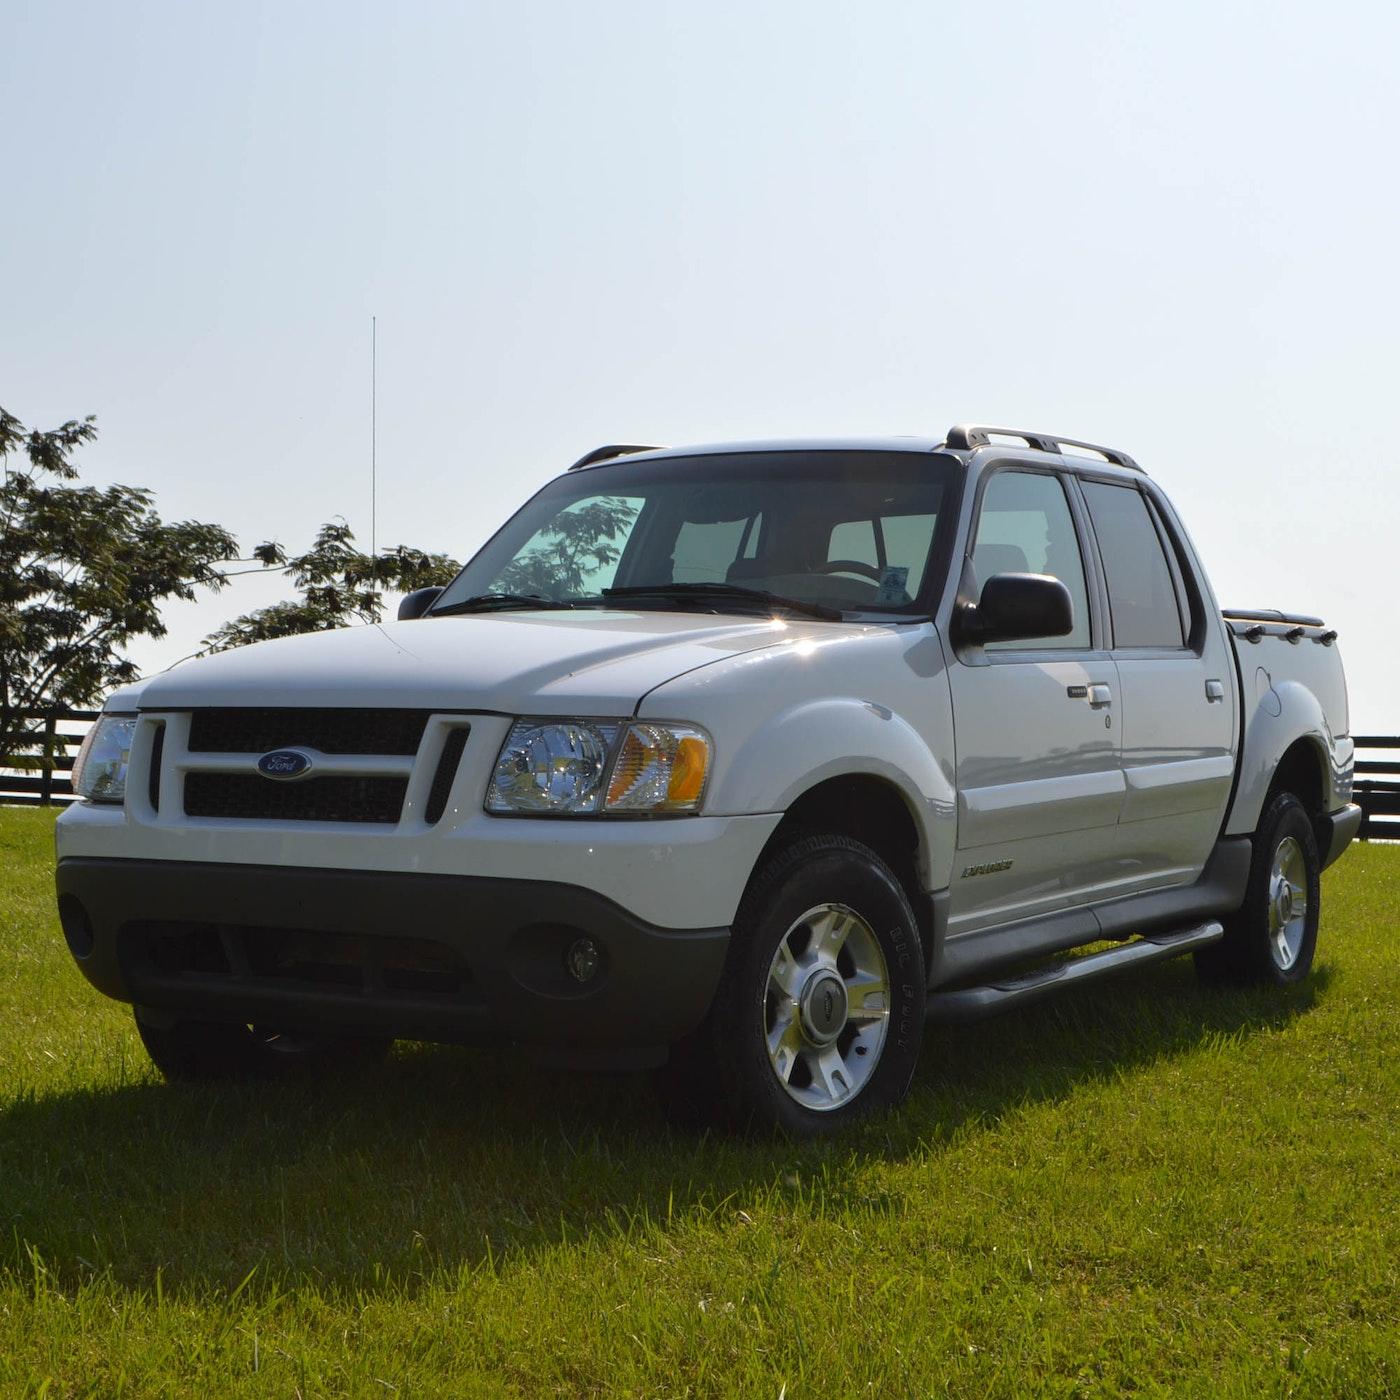 2002 ford explorer sport trac pickup truck ebth. Black Bedroom Furniture Sets. Home Design Ideas